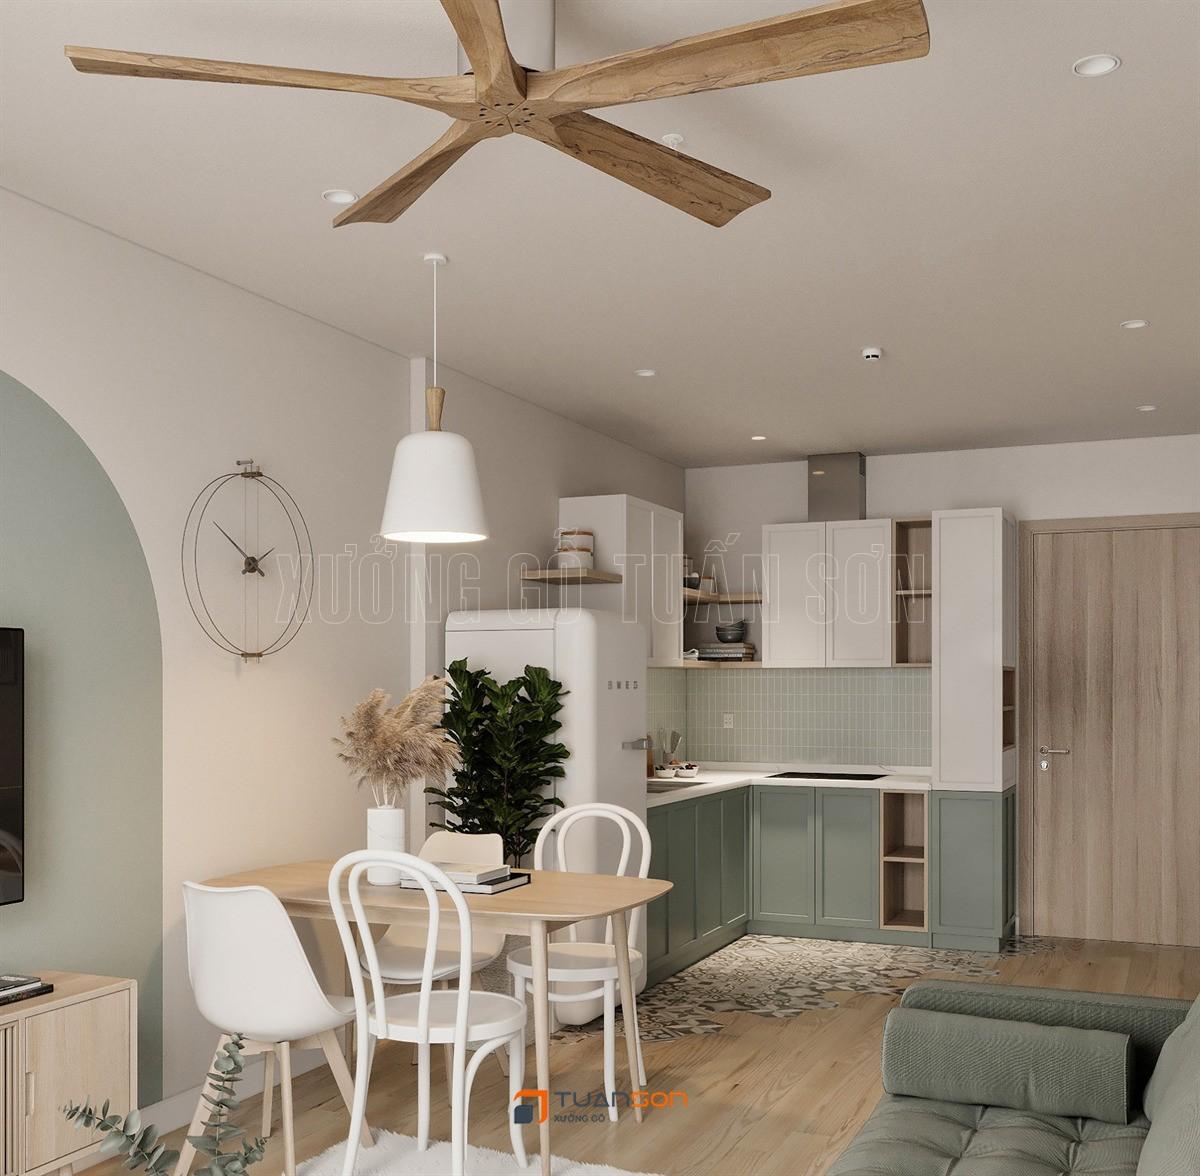 Thiết kế nội thất căn hộ 1 PN + 1 (43m2) S2.08 Vinhomes Ocean Park